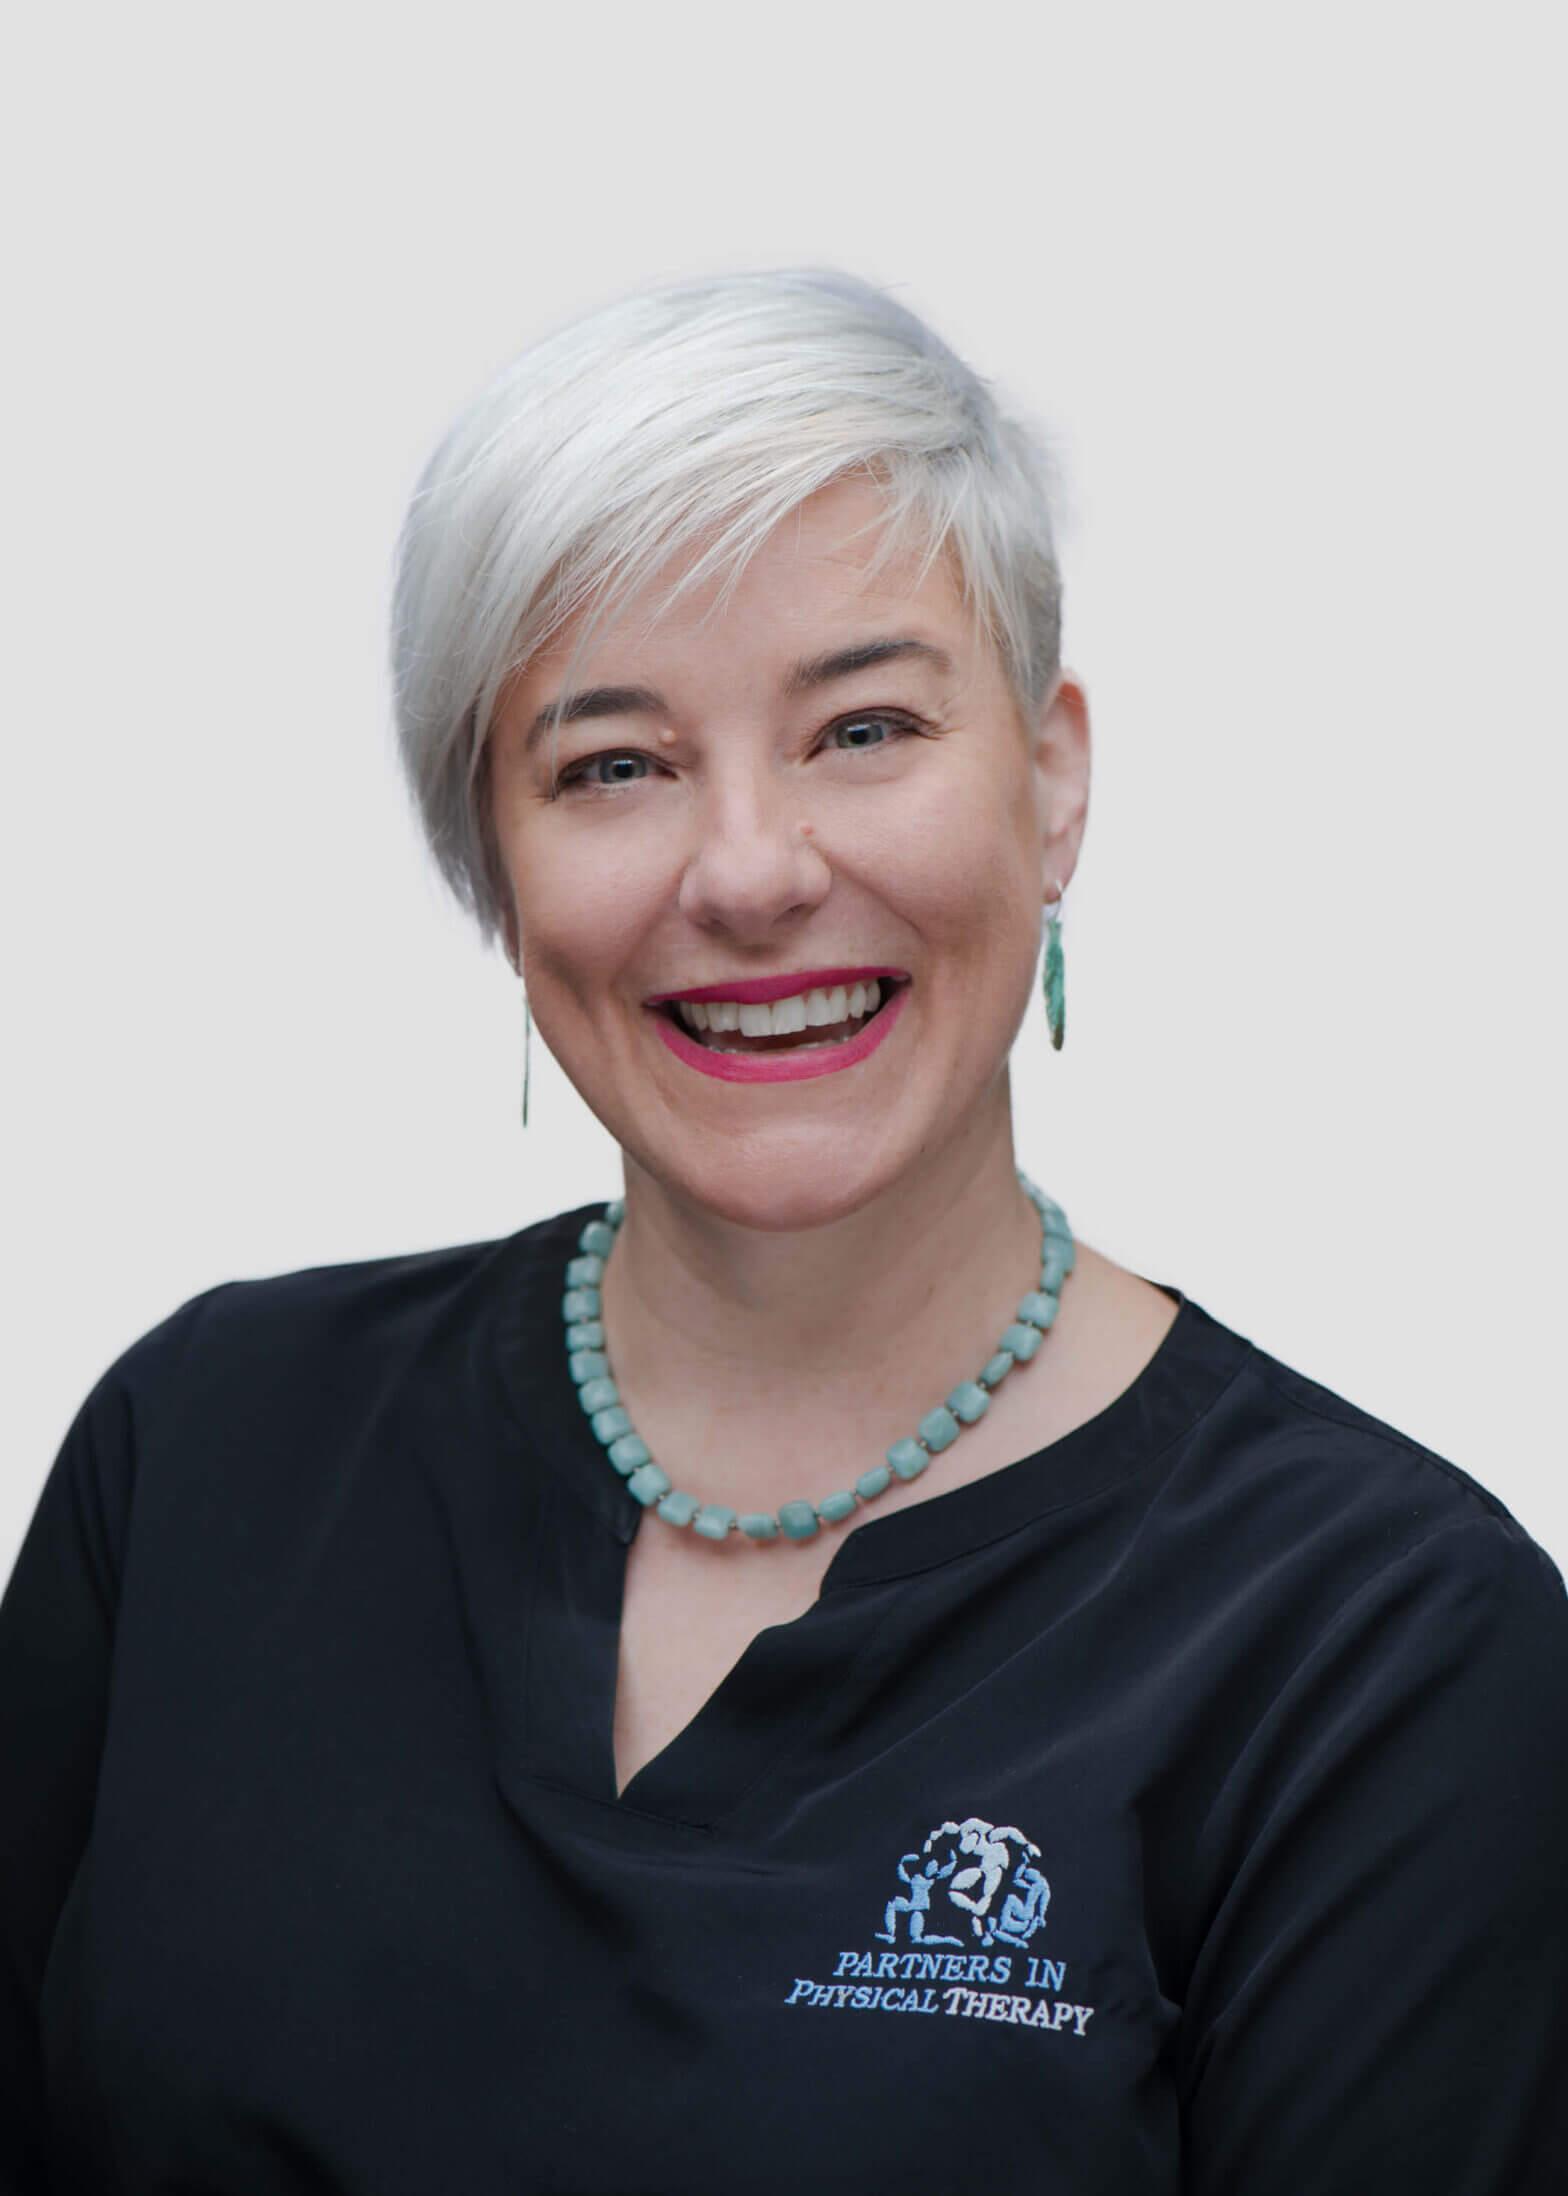 Erin McInnis